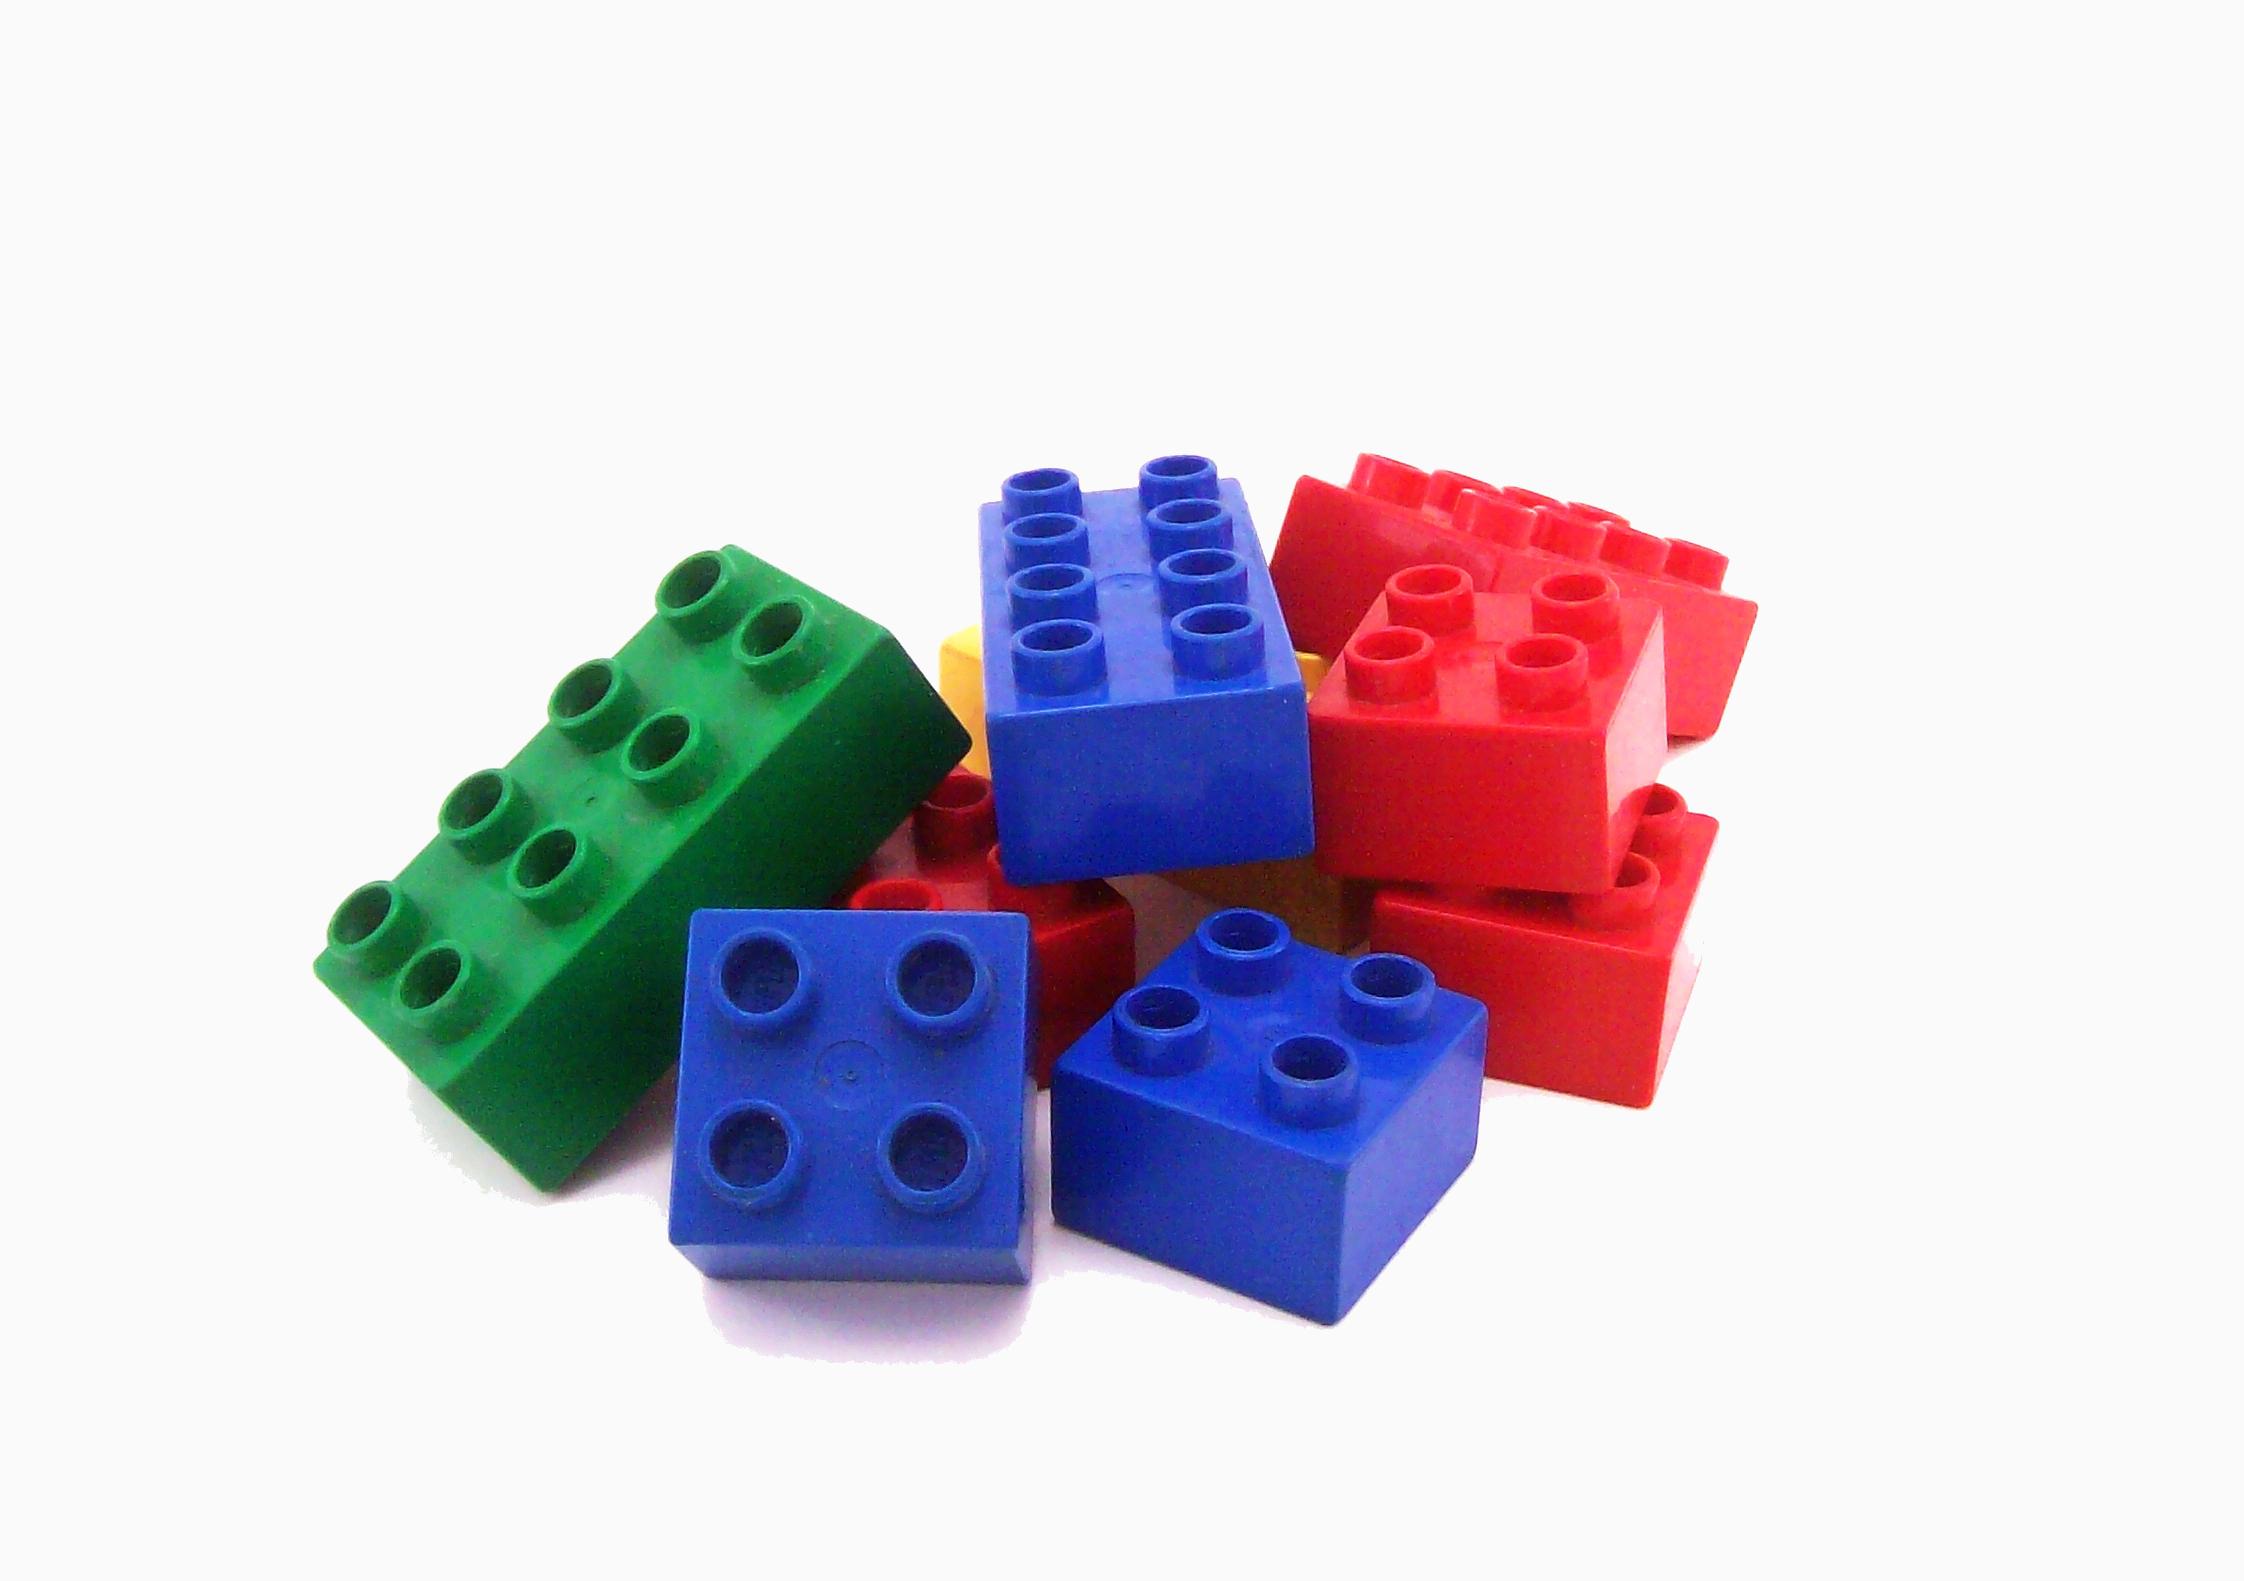 2244x1581 Lego Clip Art Borders The Cliparts 2